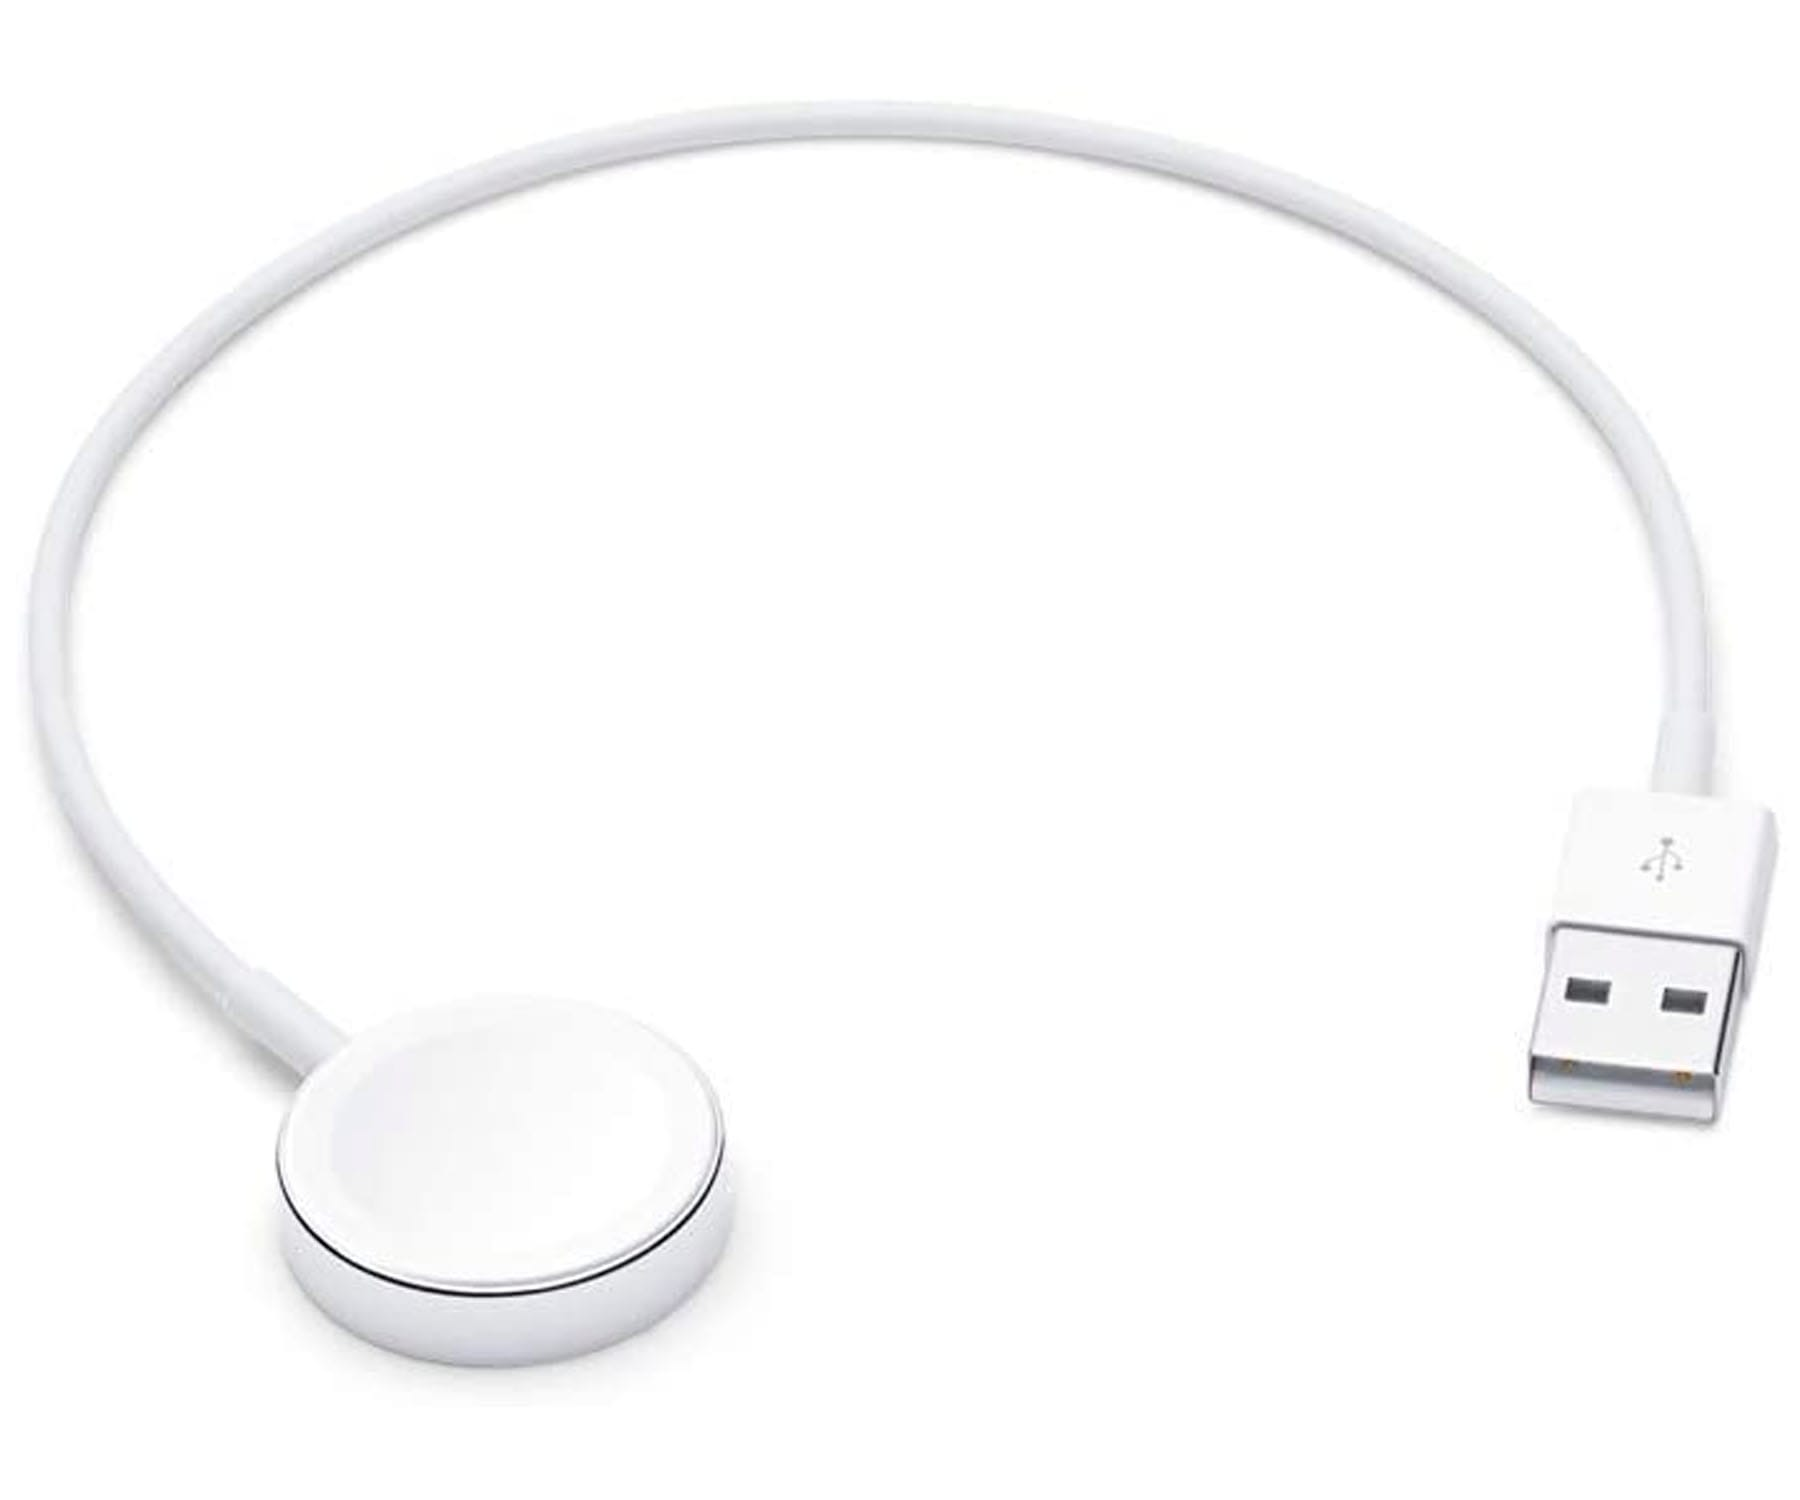 APPLE BASE DE CARGA MAGNÉTICA BLANCO PARA APPLE WATCH USB 0.3M